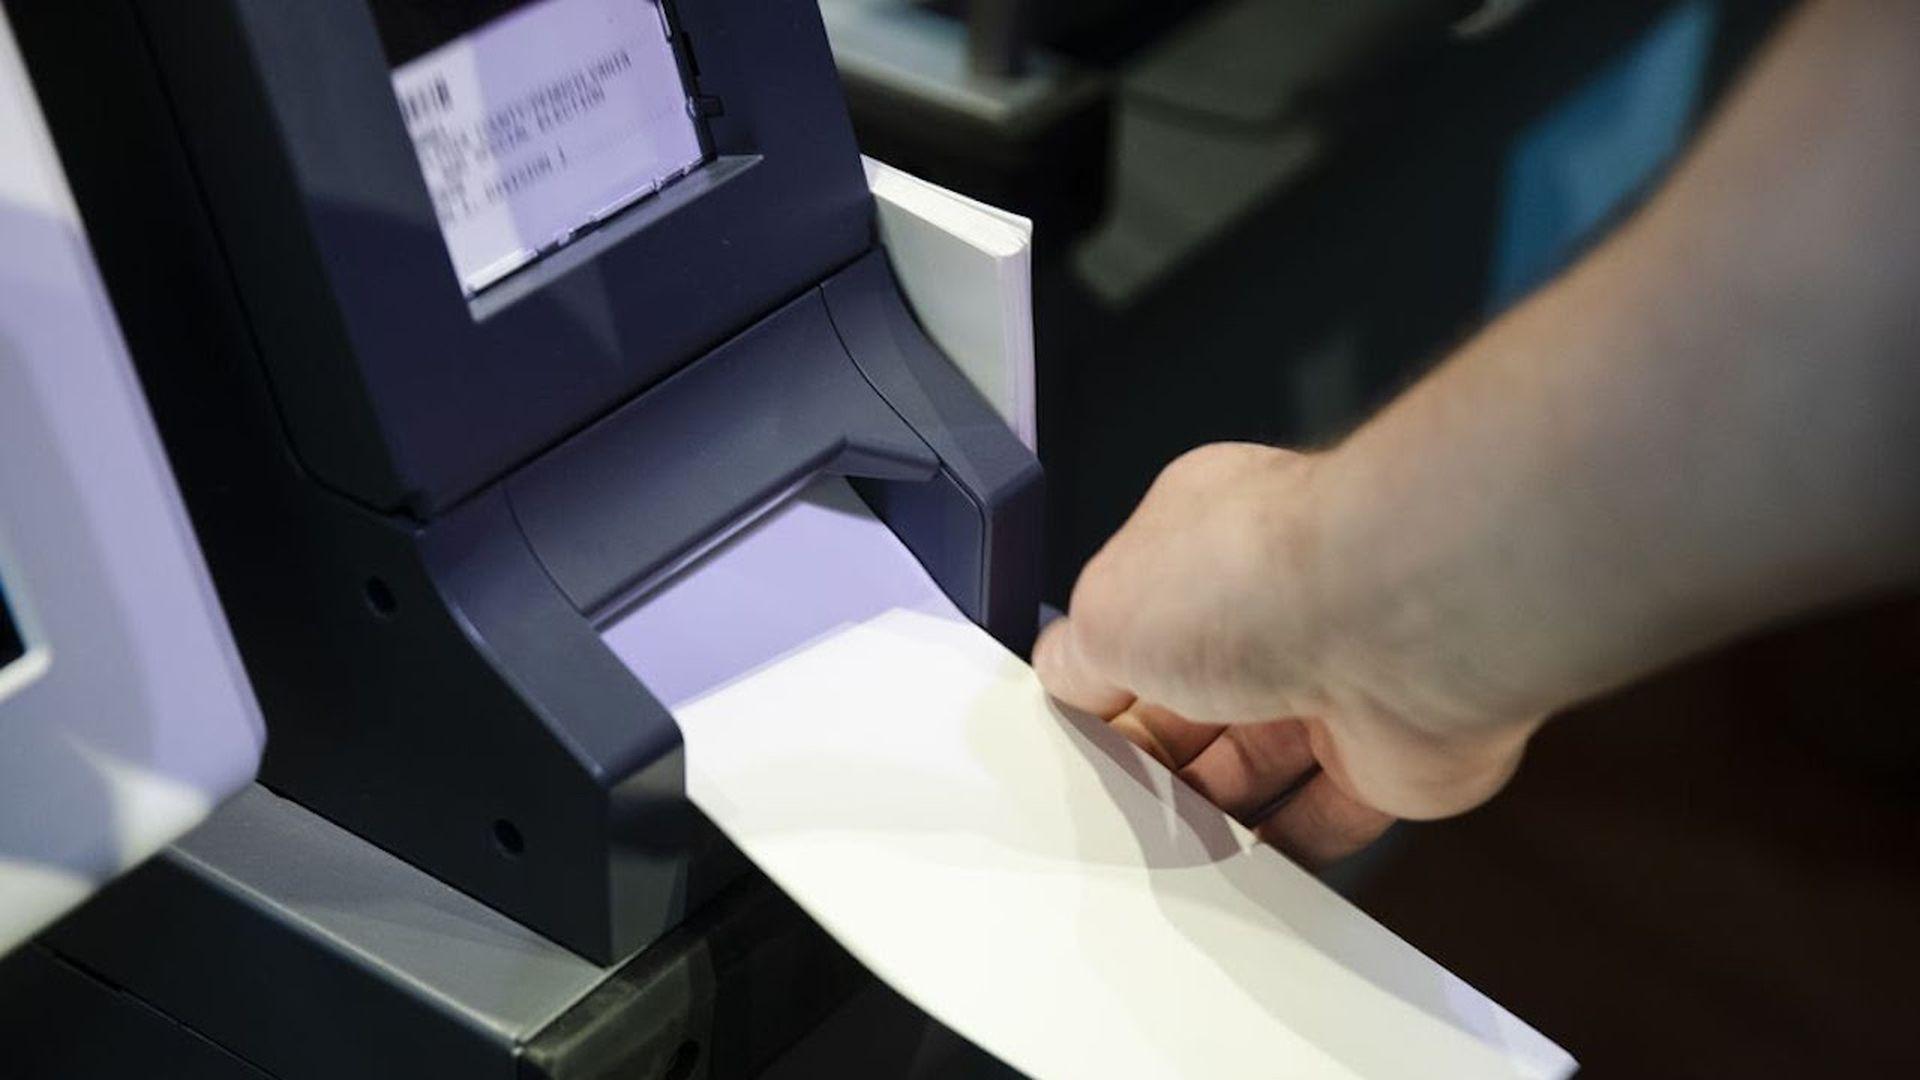 Voting machine with older software